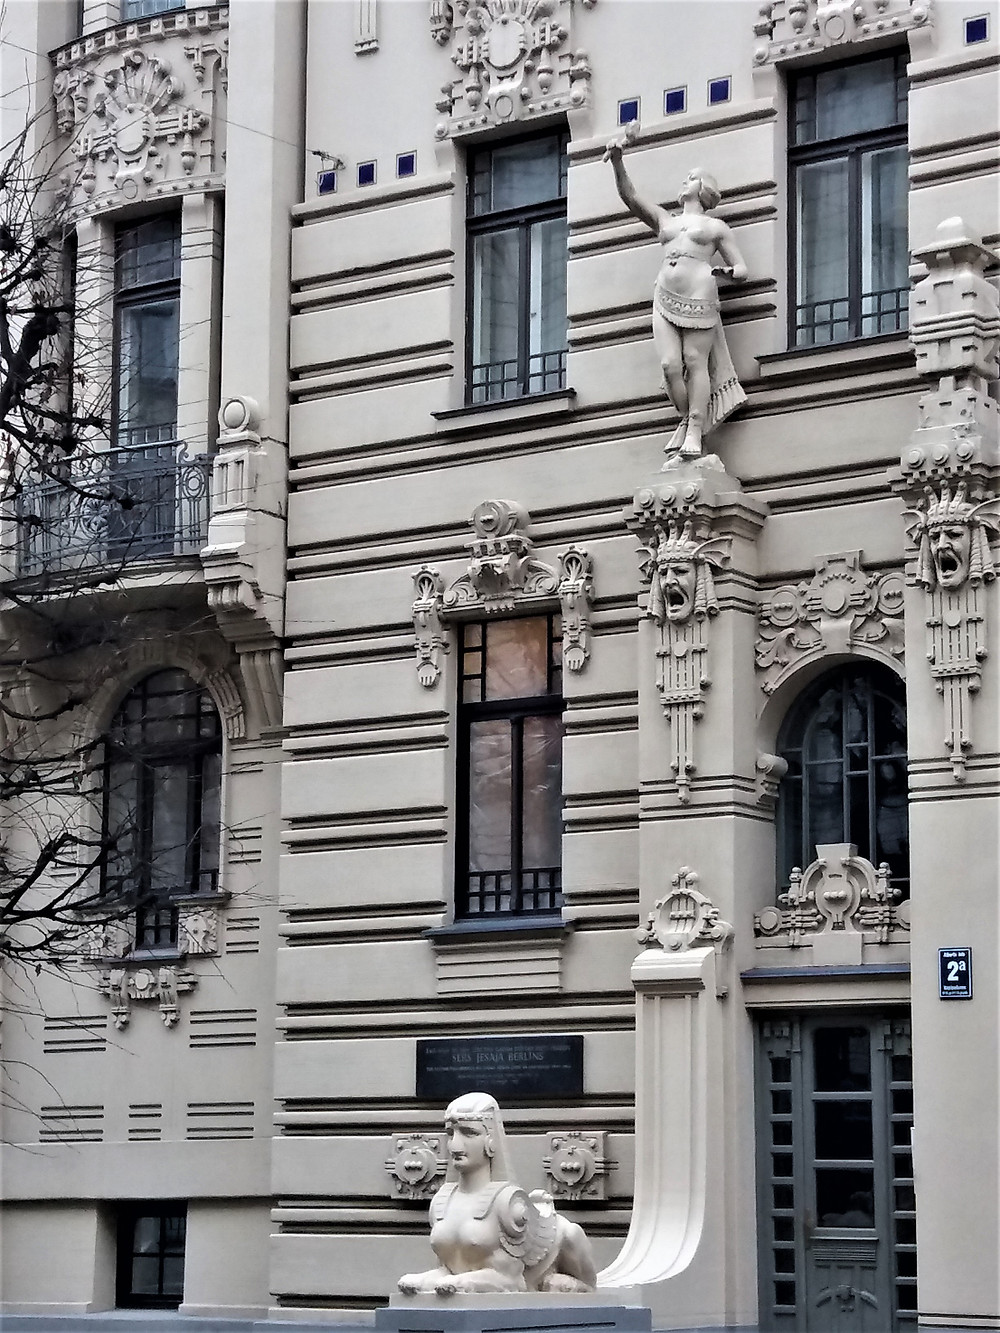 Egyptian Art Nouveau Style Facade 2a Albert Street, Riga, Latvia ©MDHarding